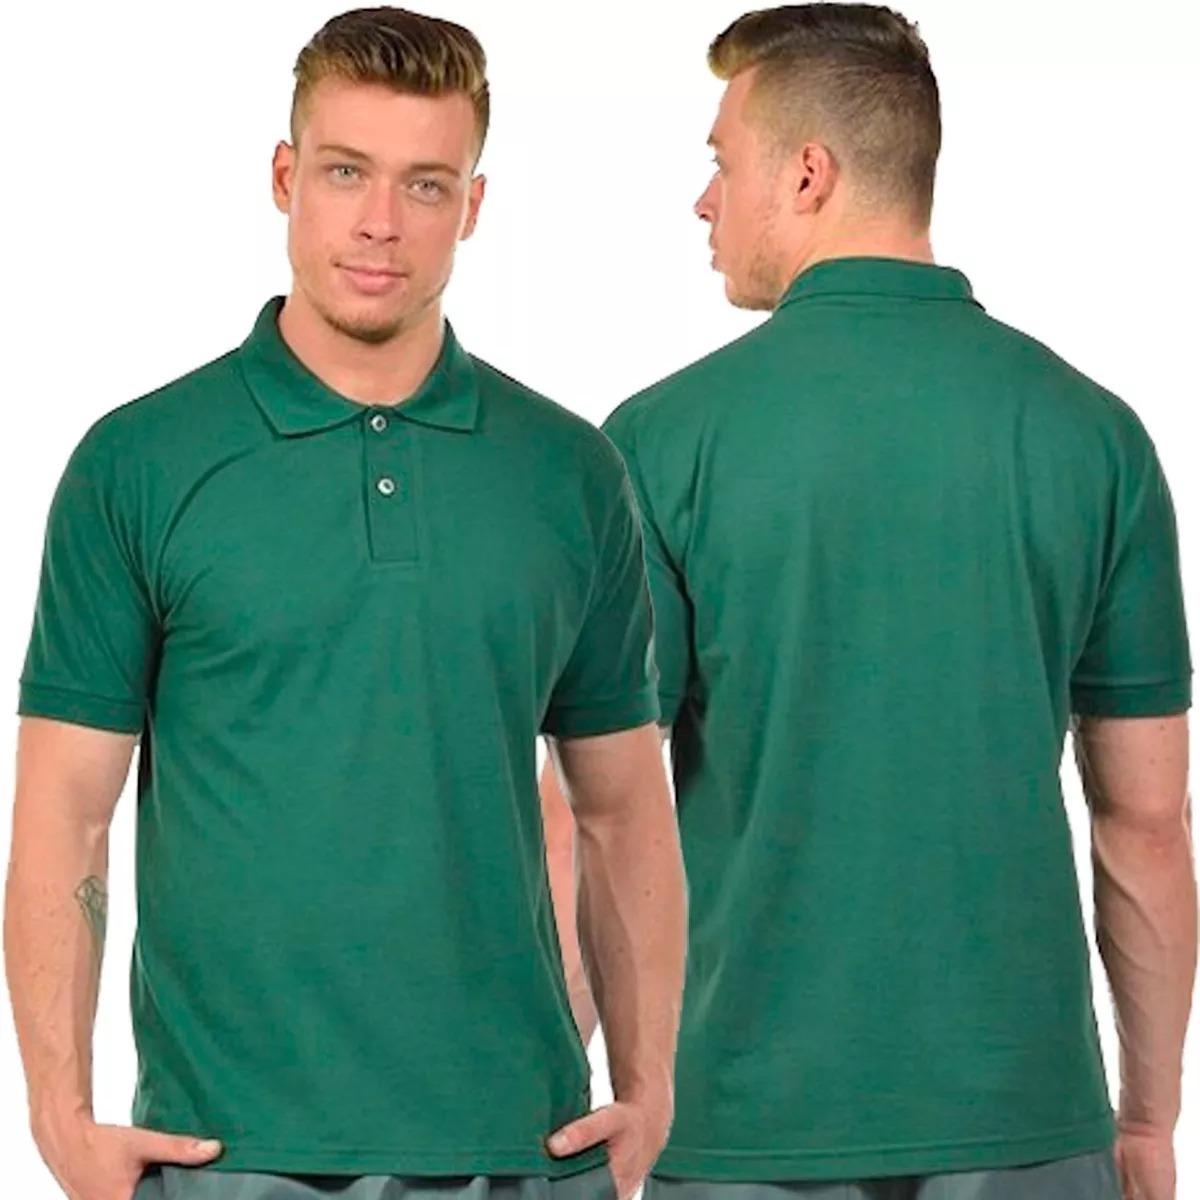 kit 2 camisas pólo masculina gola sortida colorida camiseta. Carregando  zoom. 1c119c603c99f